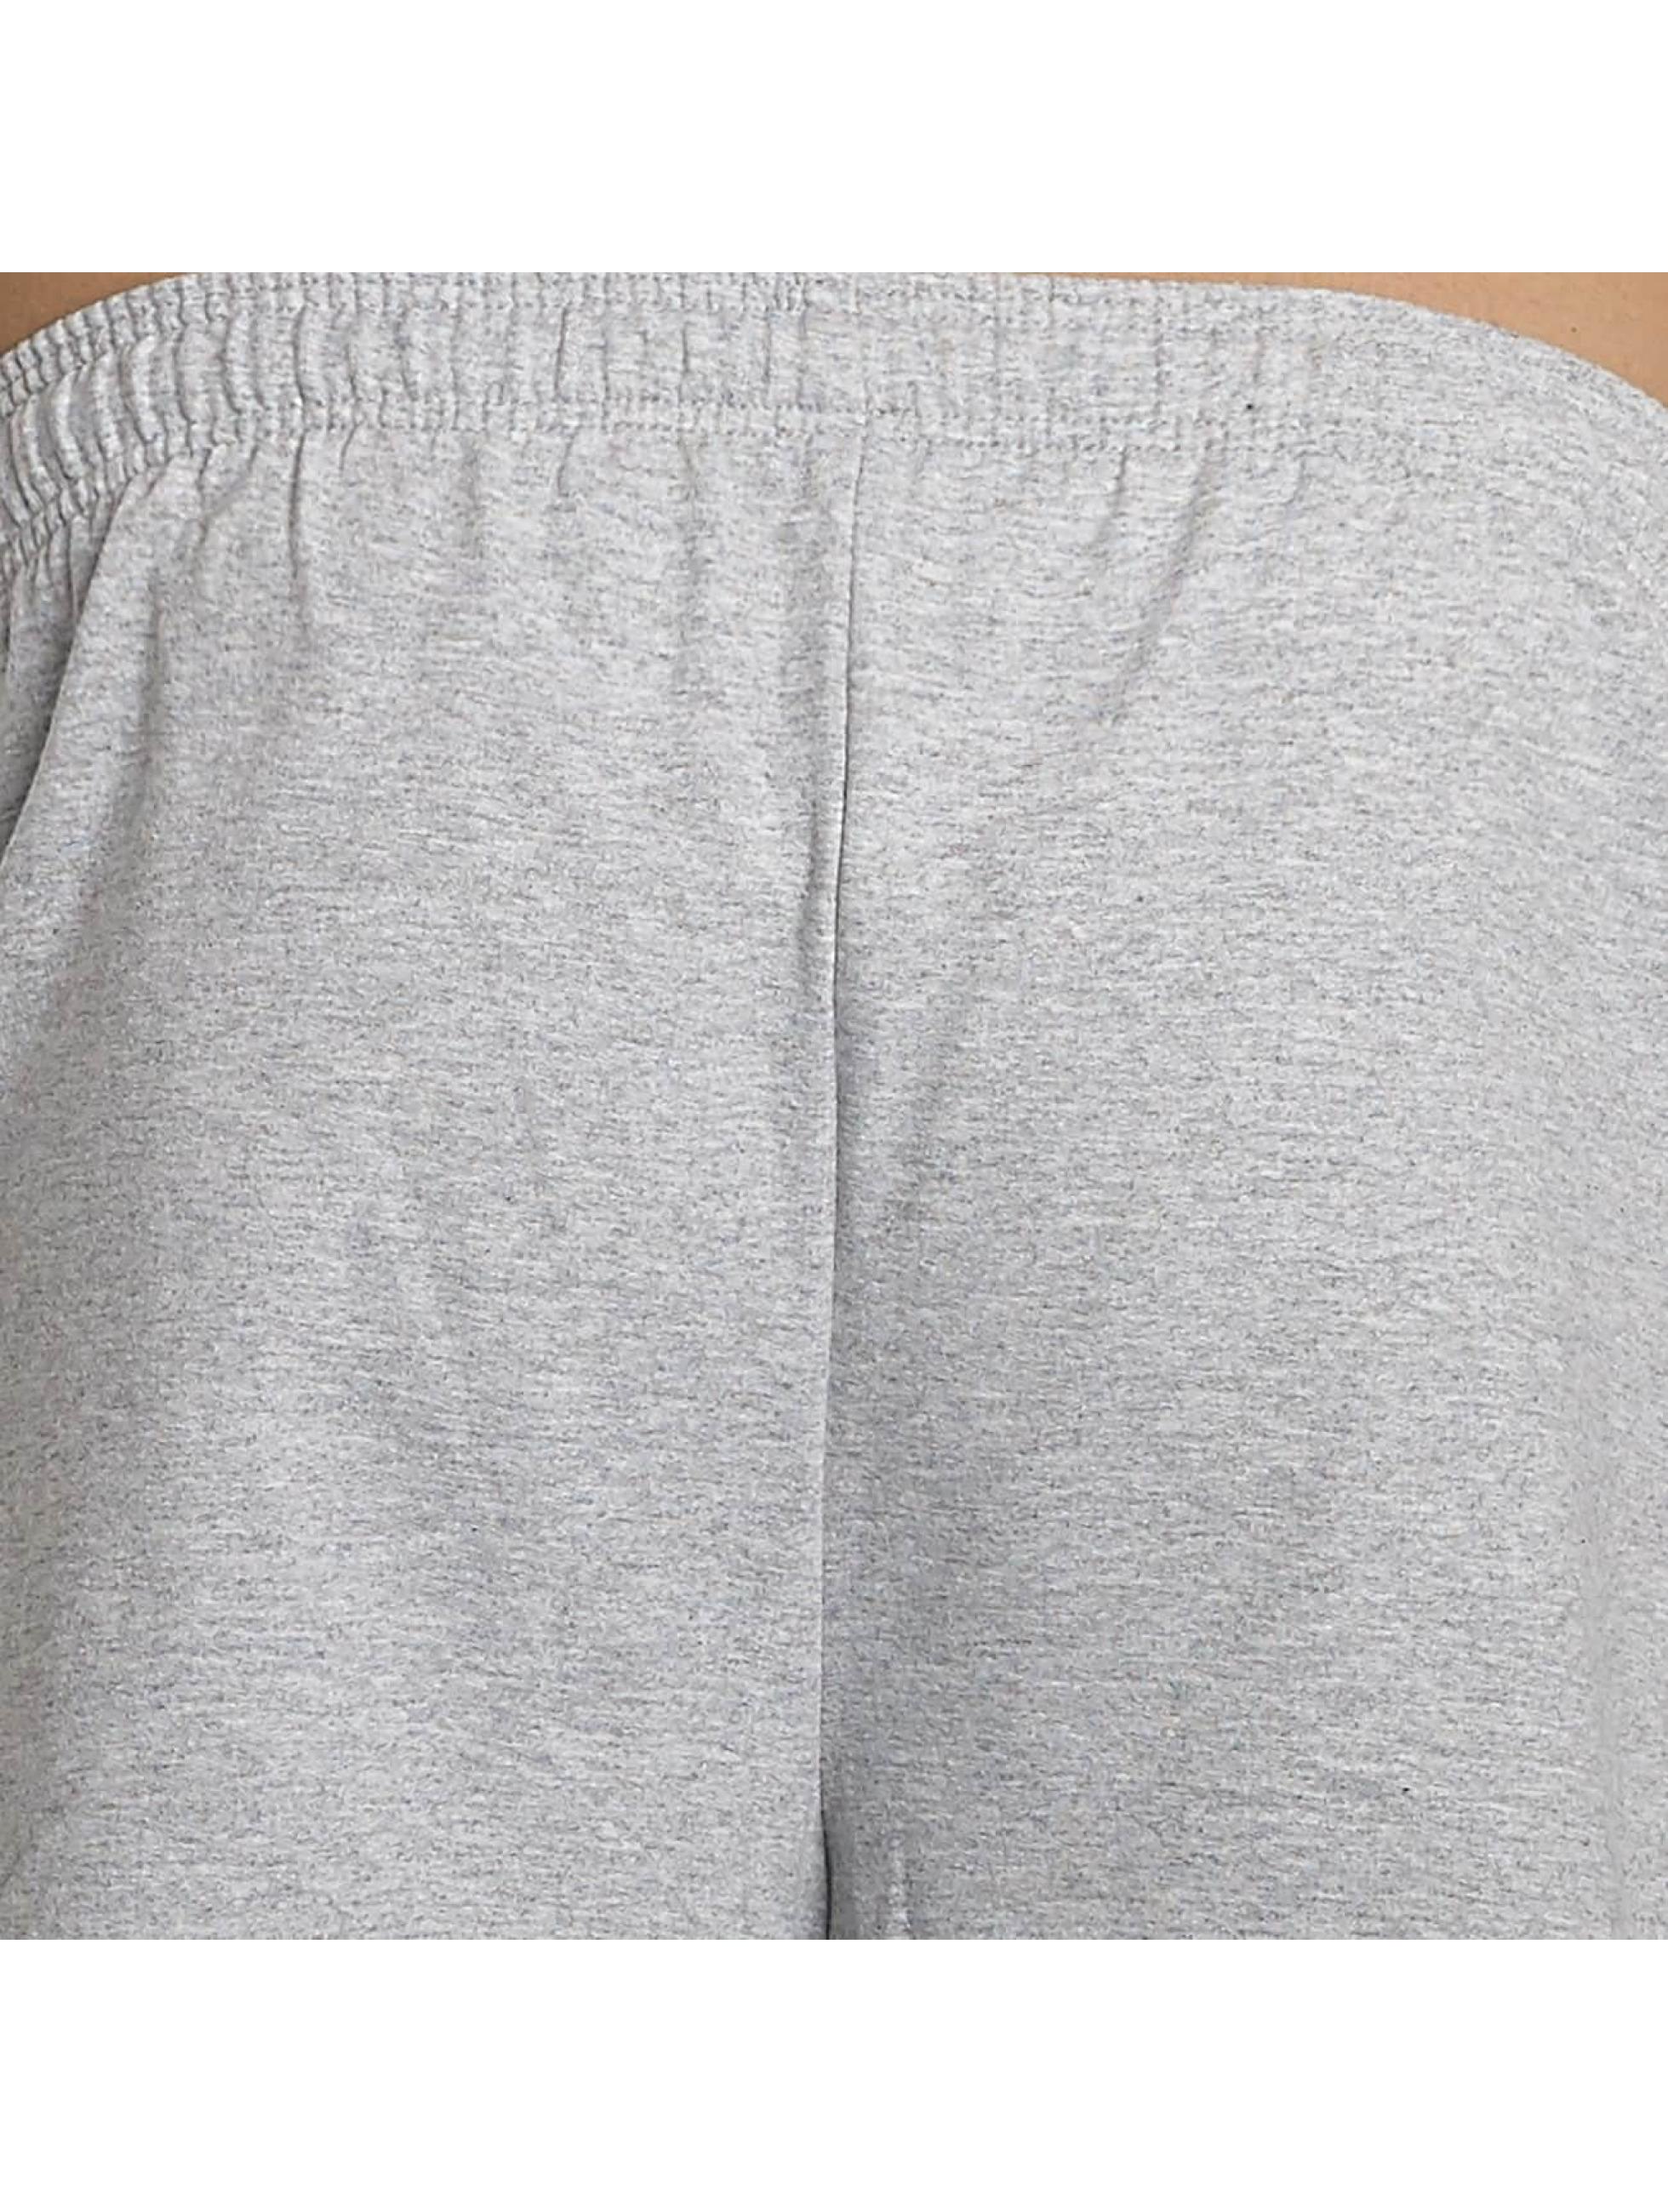 Nebbia Shorts N3 grau